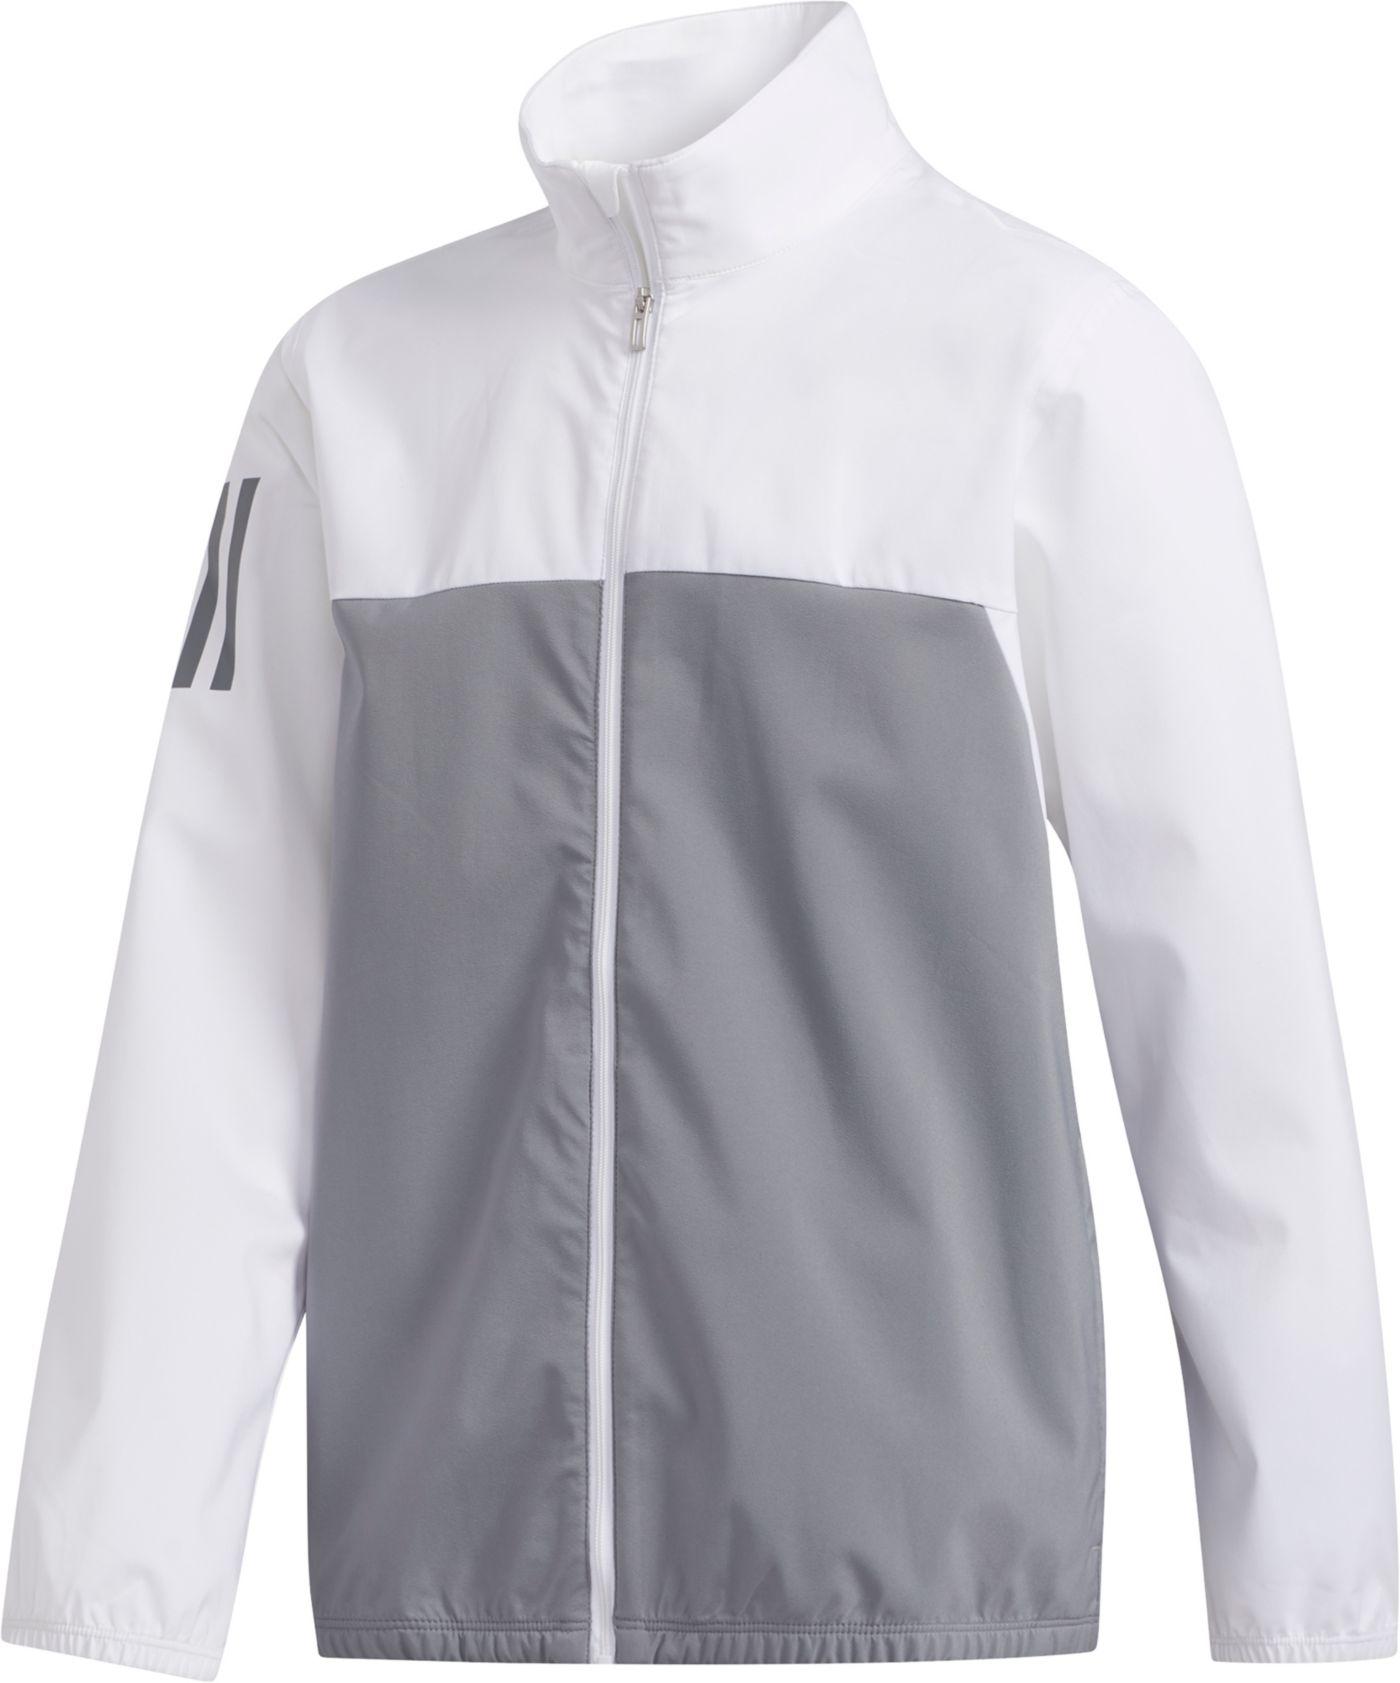 adidas Boys' Provisional Full Zip Golf Rain Jacket